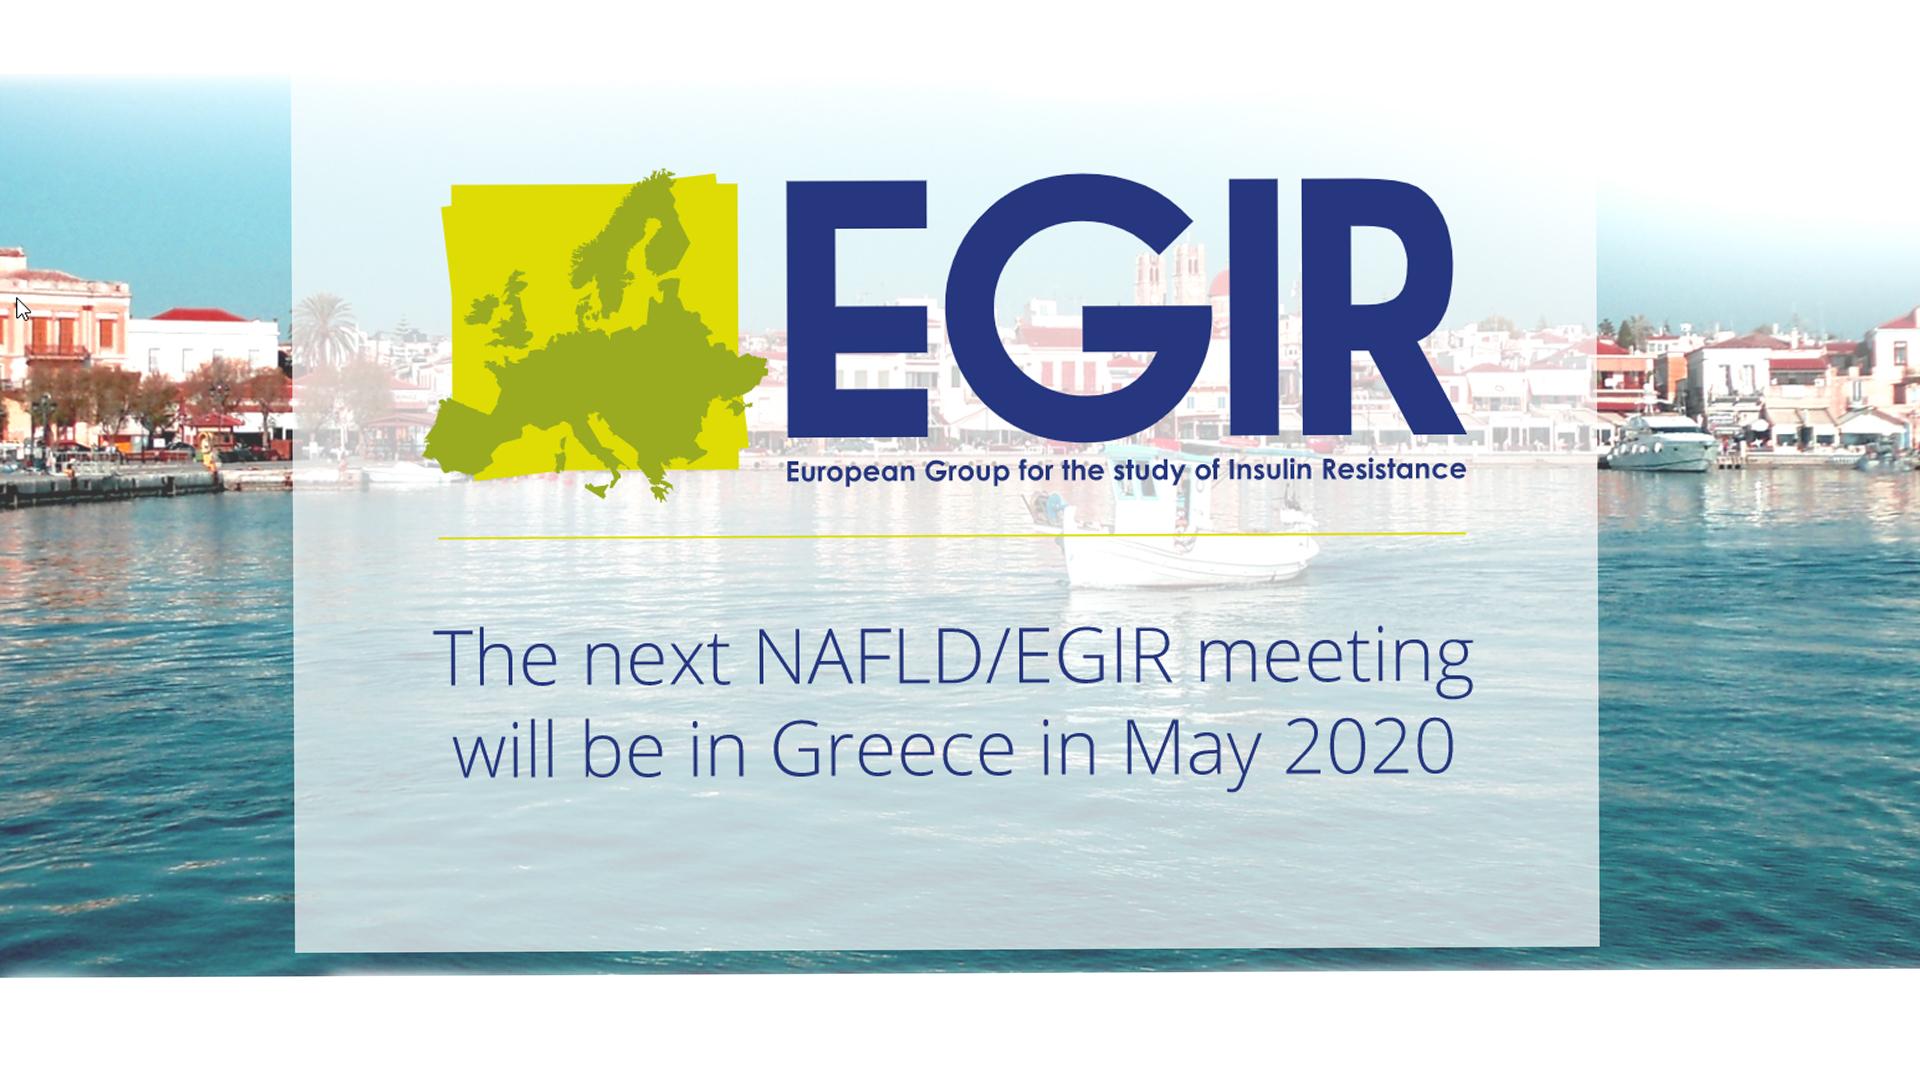 Joint Meeting of the EASD-NAFLD/EGIR Study groups